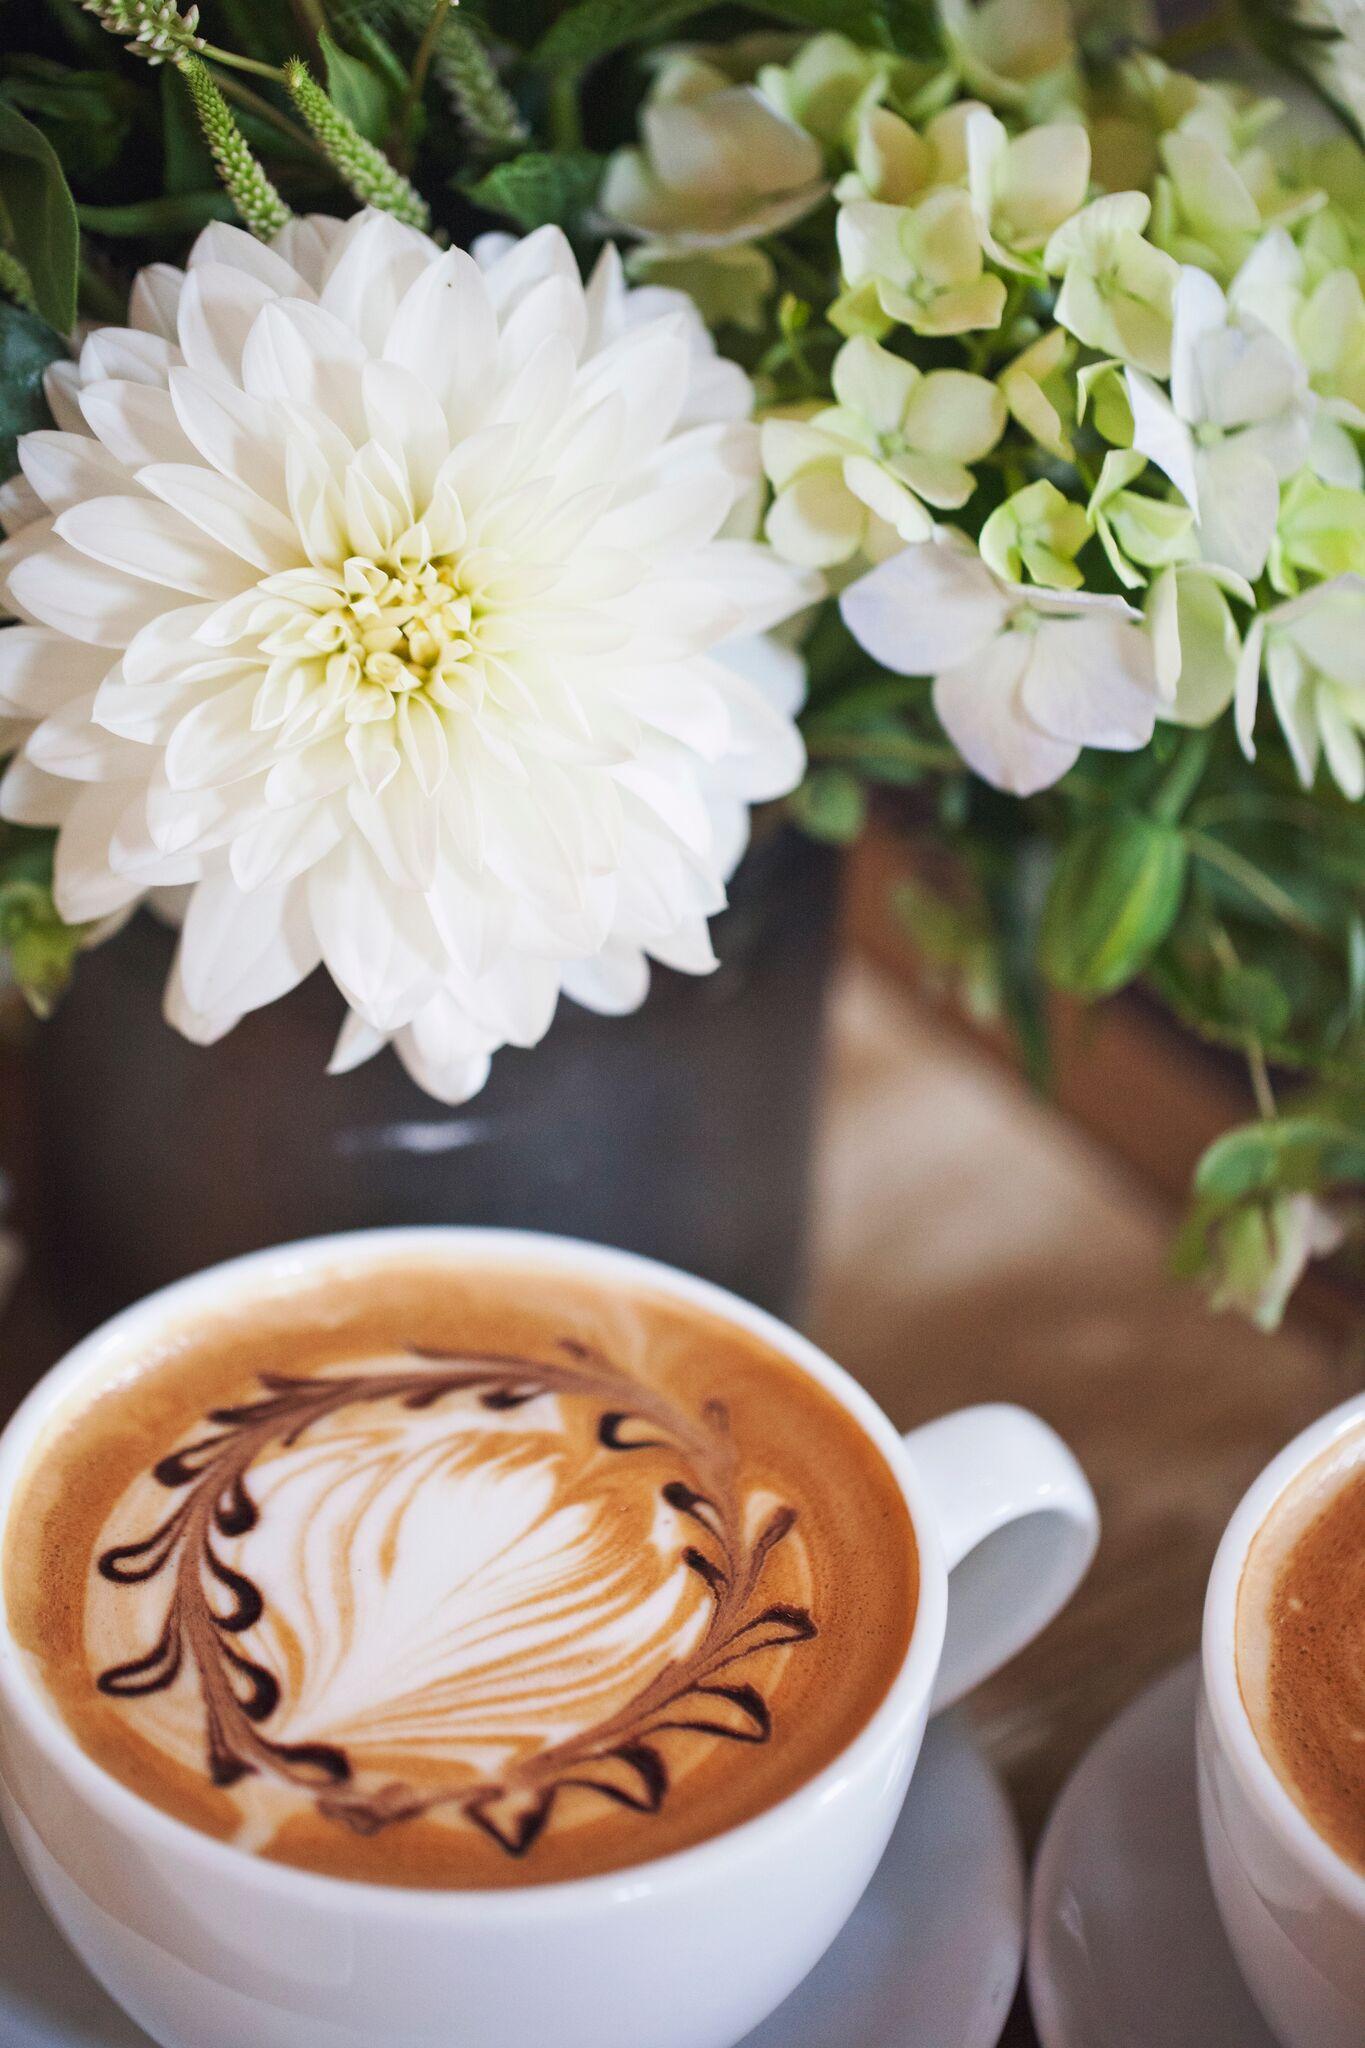 Mocha Latte Art by Espresso Elegance Catering